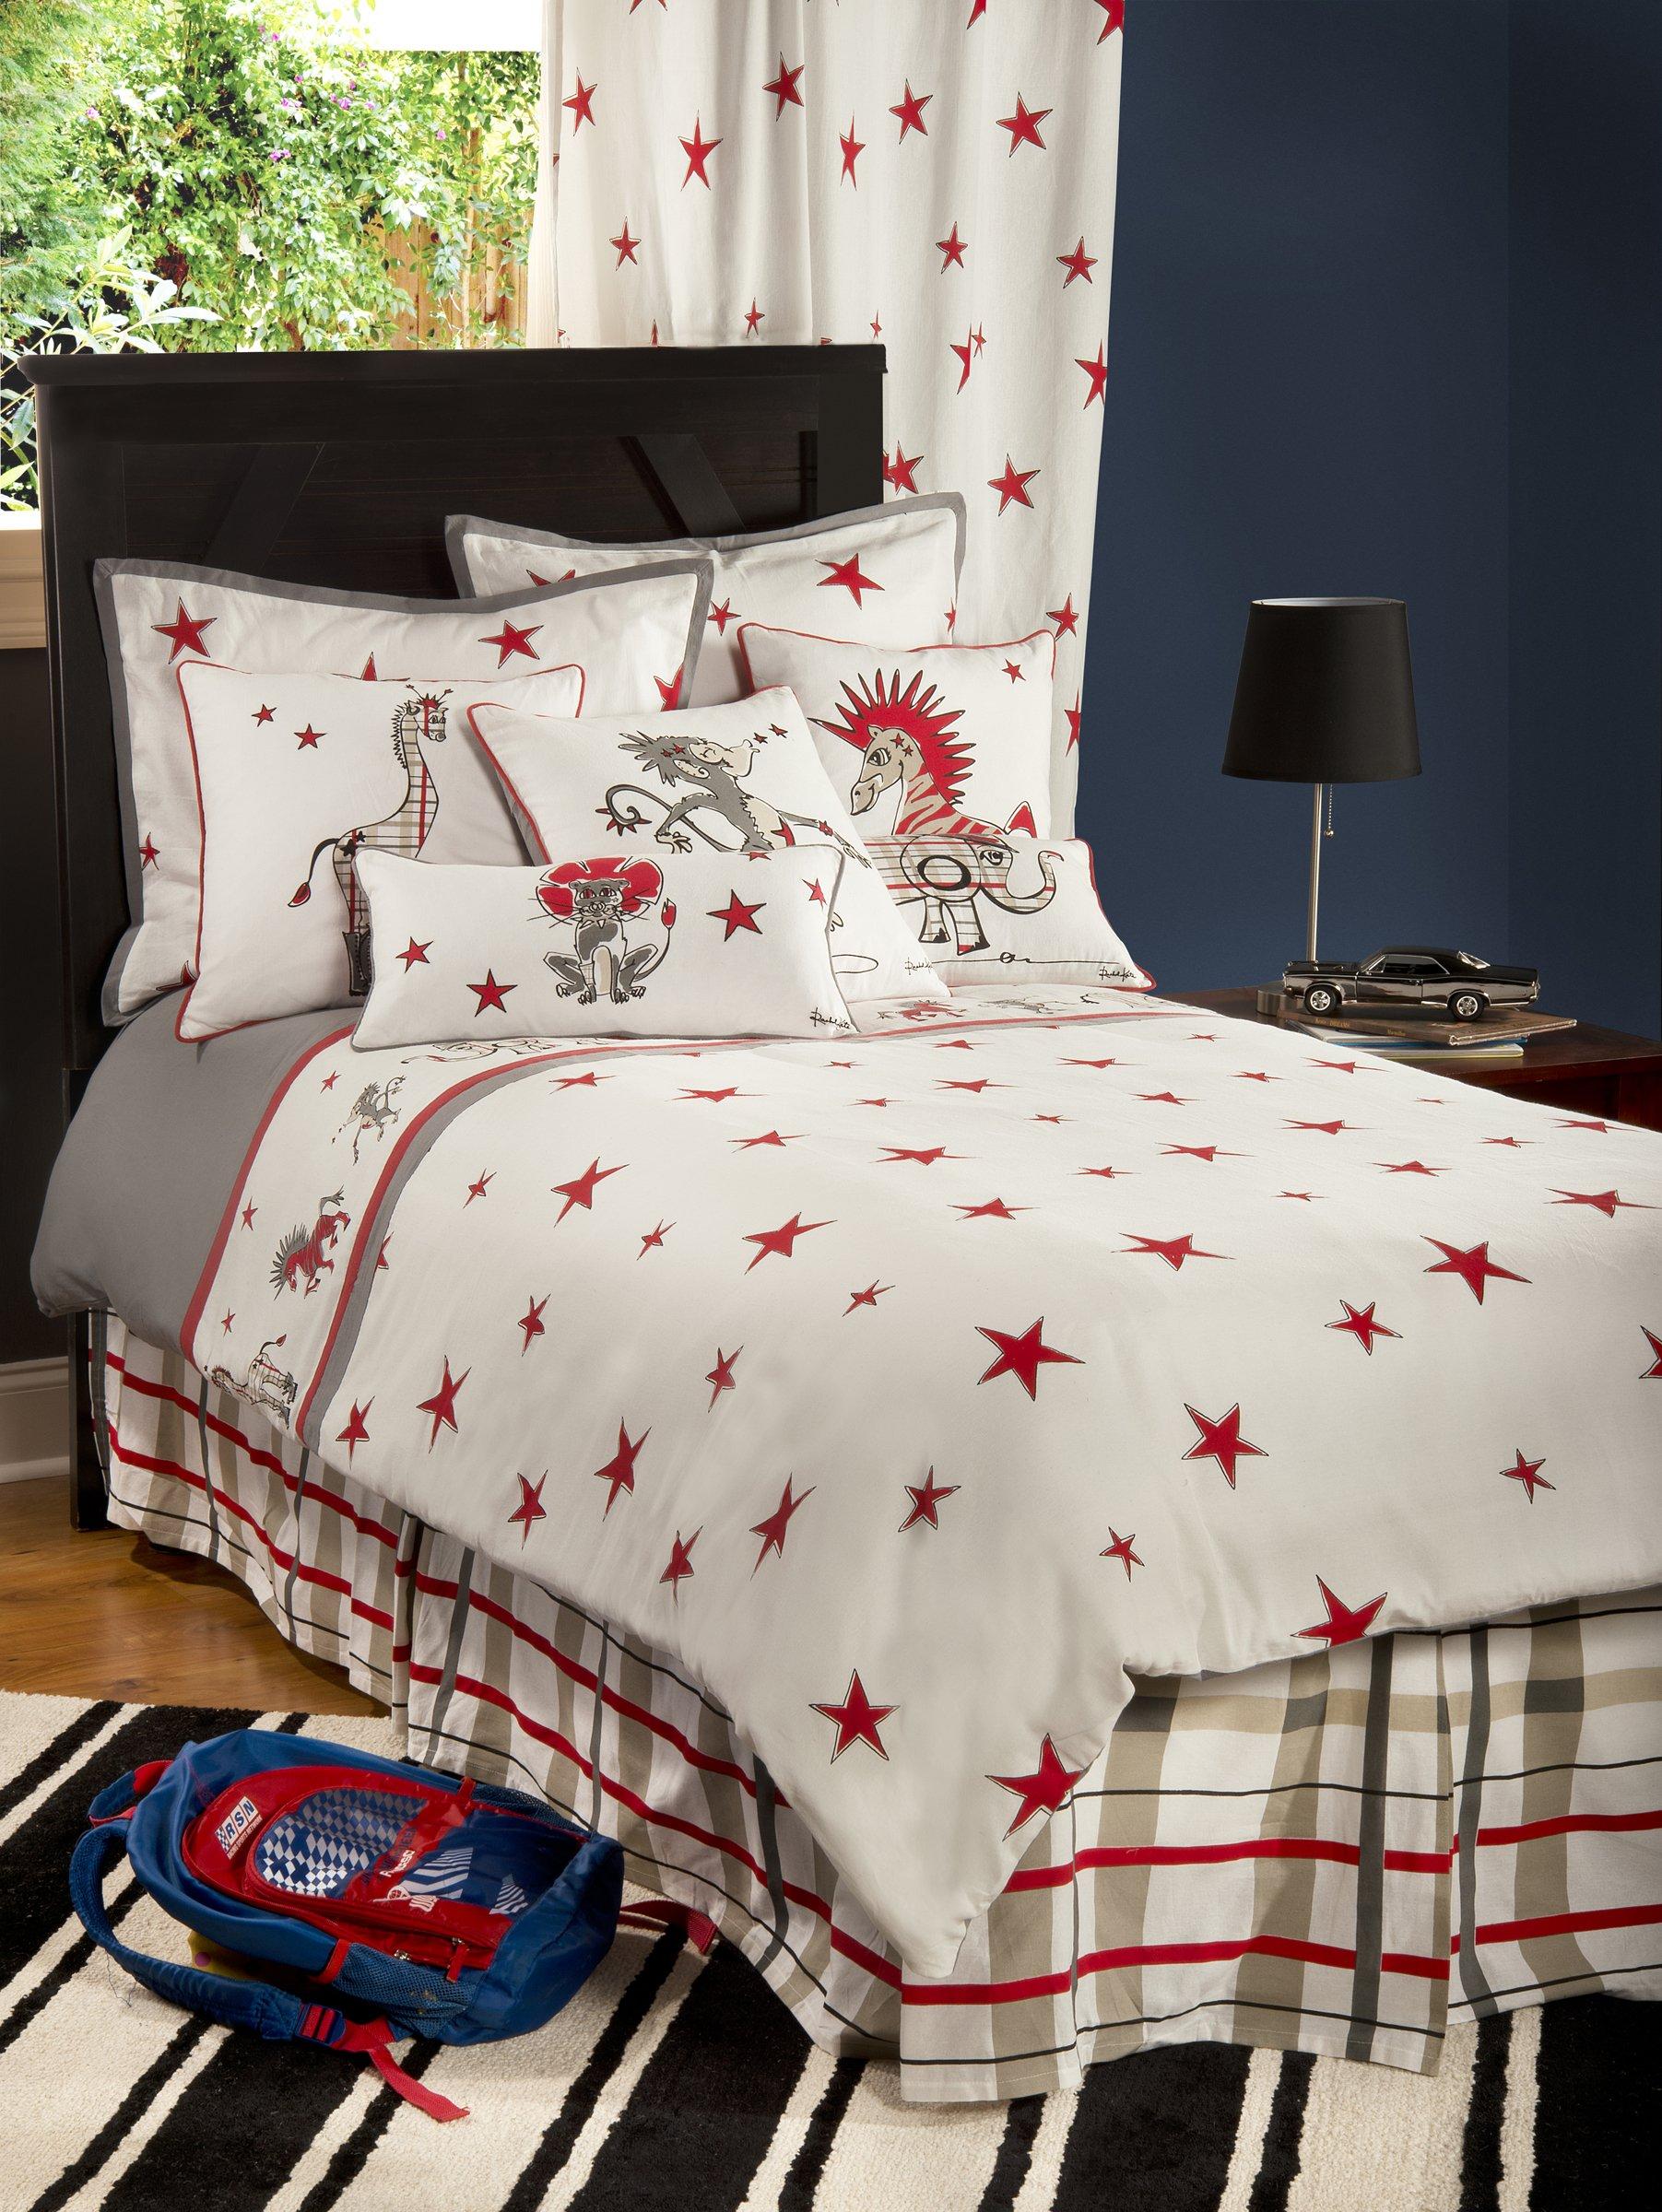 Rizzy Home Boys Punk Animal Stars 3-Piece Comforter Set, Full